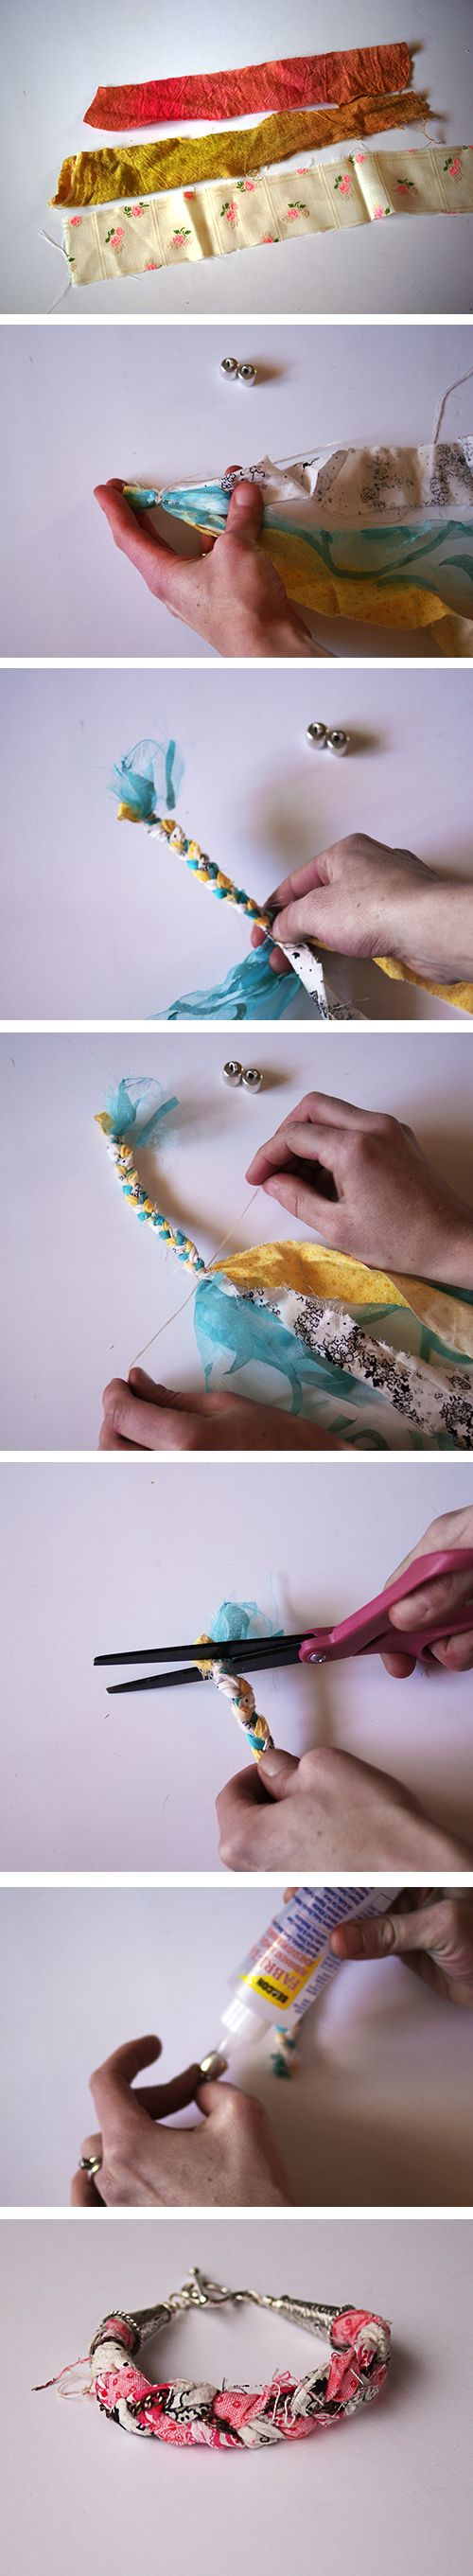 Fabric Scrap Bracelets - Pulsera elaborada con tela reutilizada